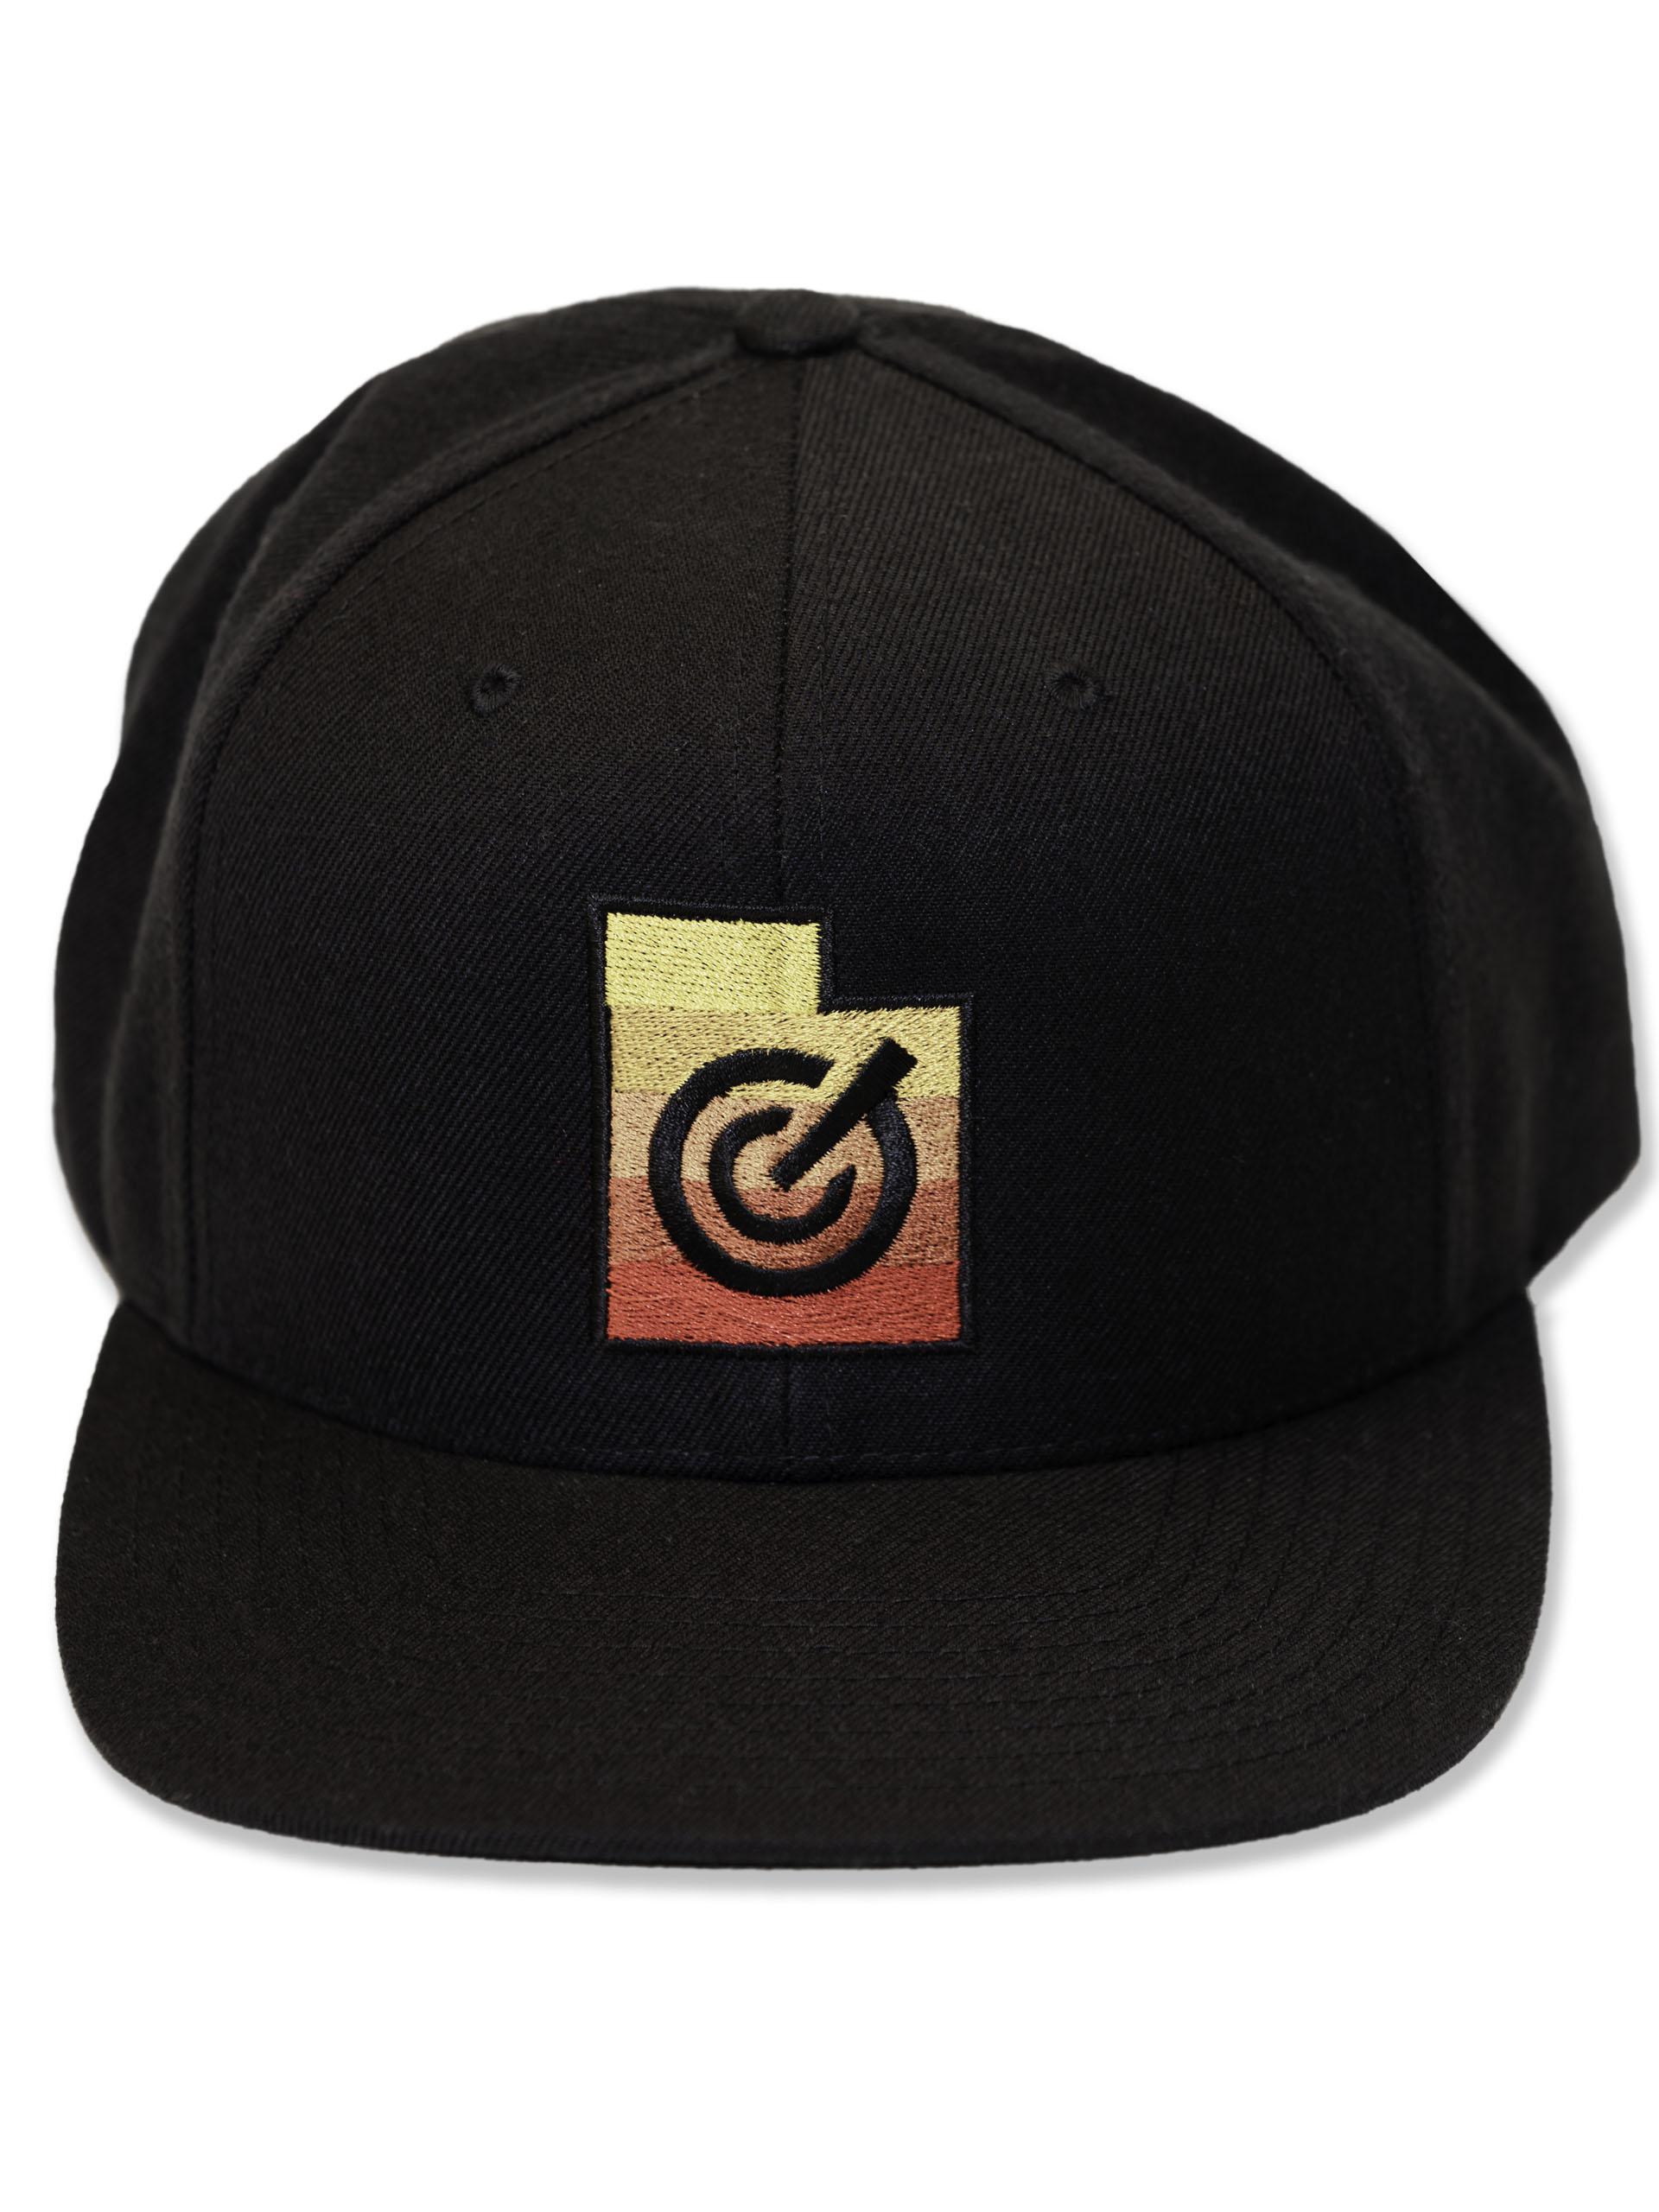 Solid Black Adjustable Utah State Hat